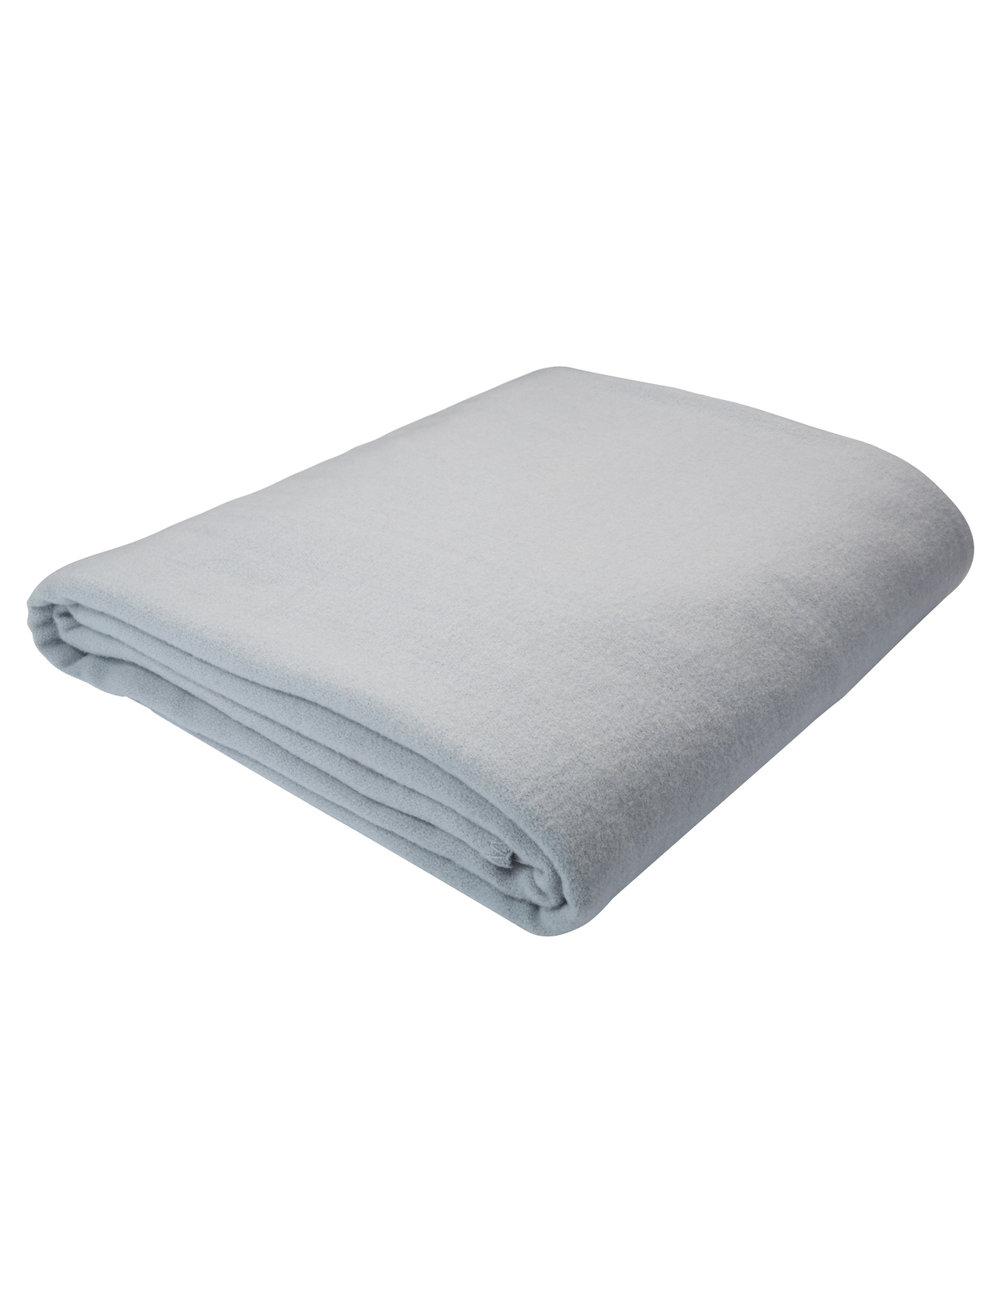 Merino Blanket Grey.jpg